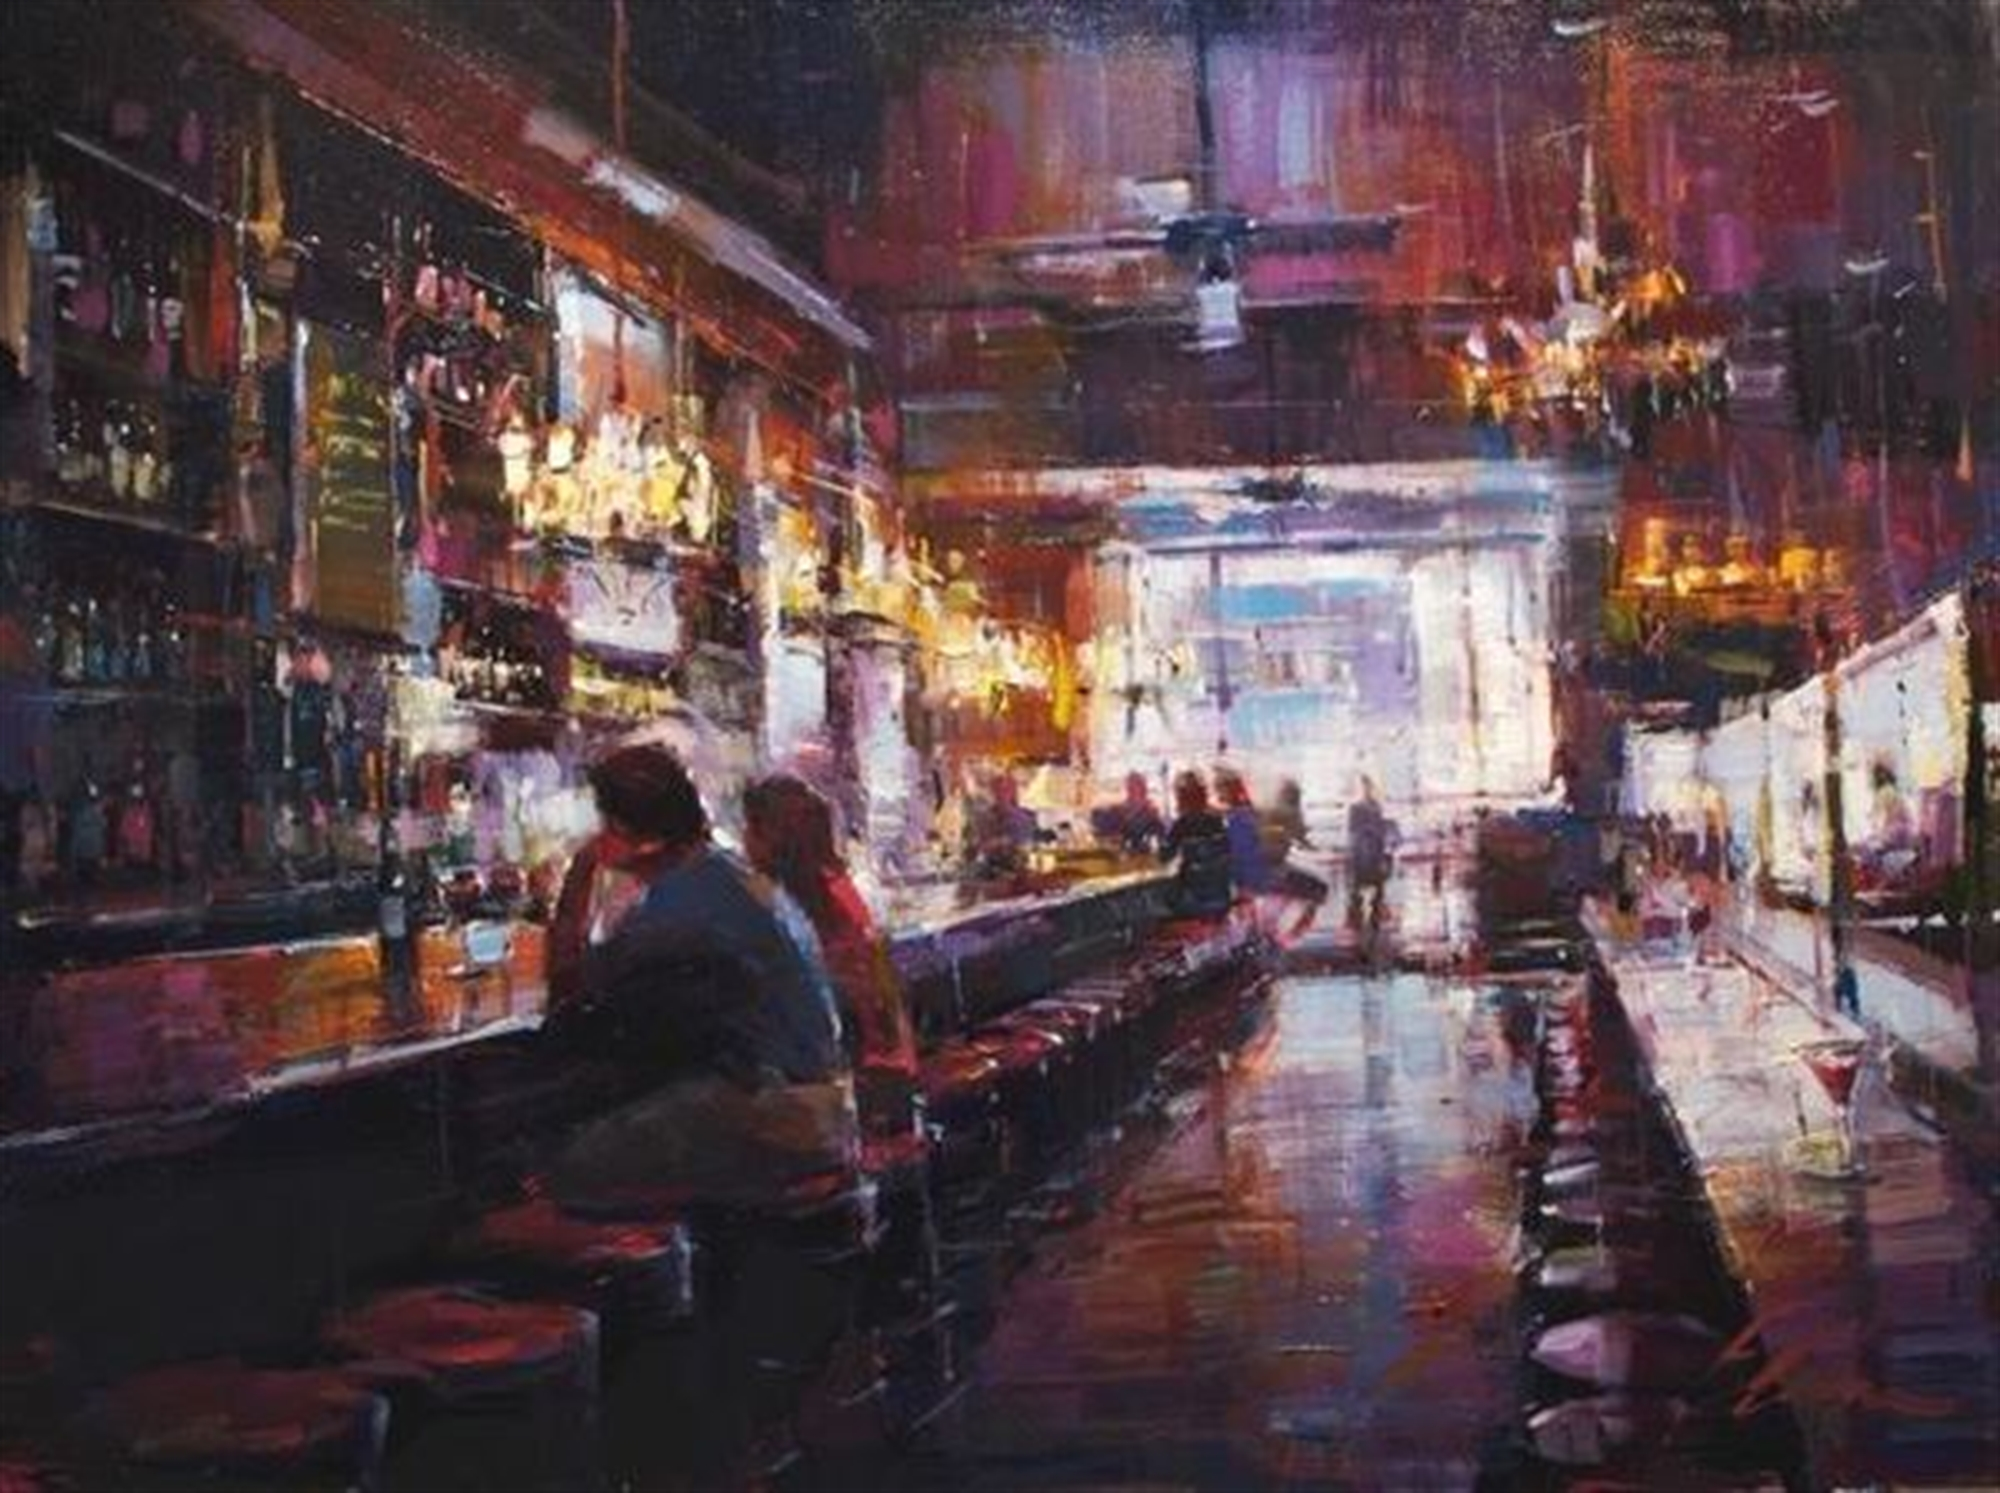 Cocktails at Carmine's by Michael Flohr